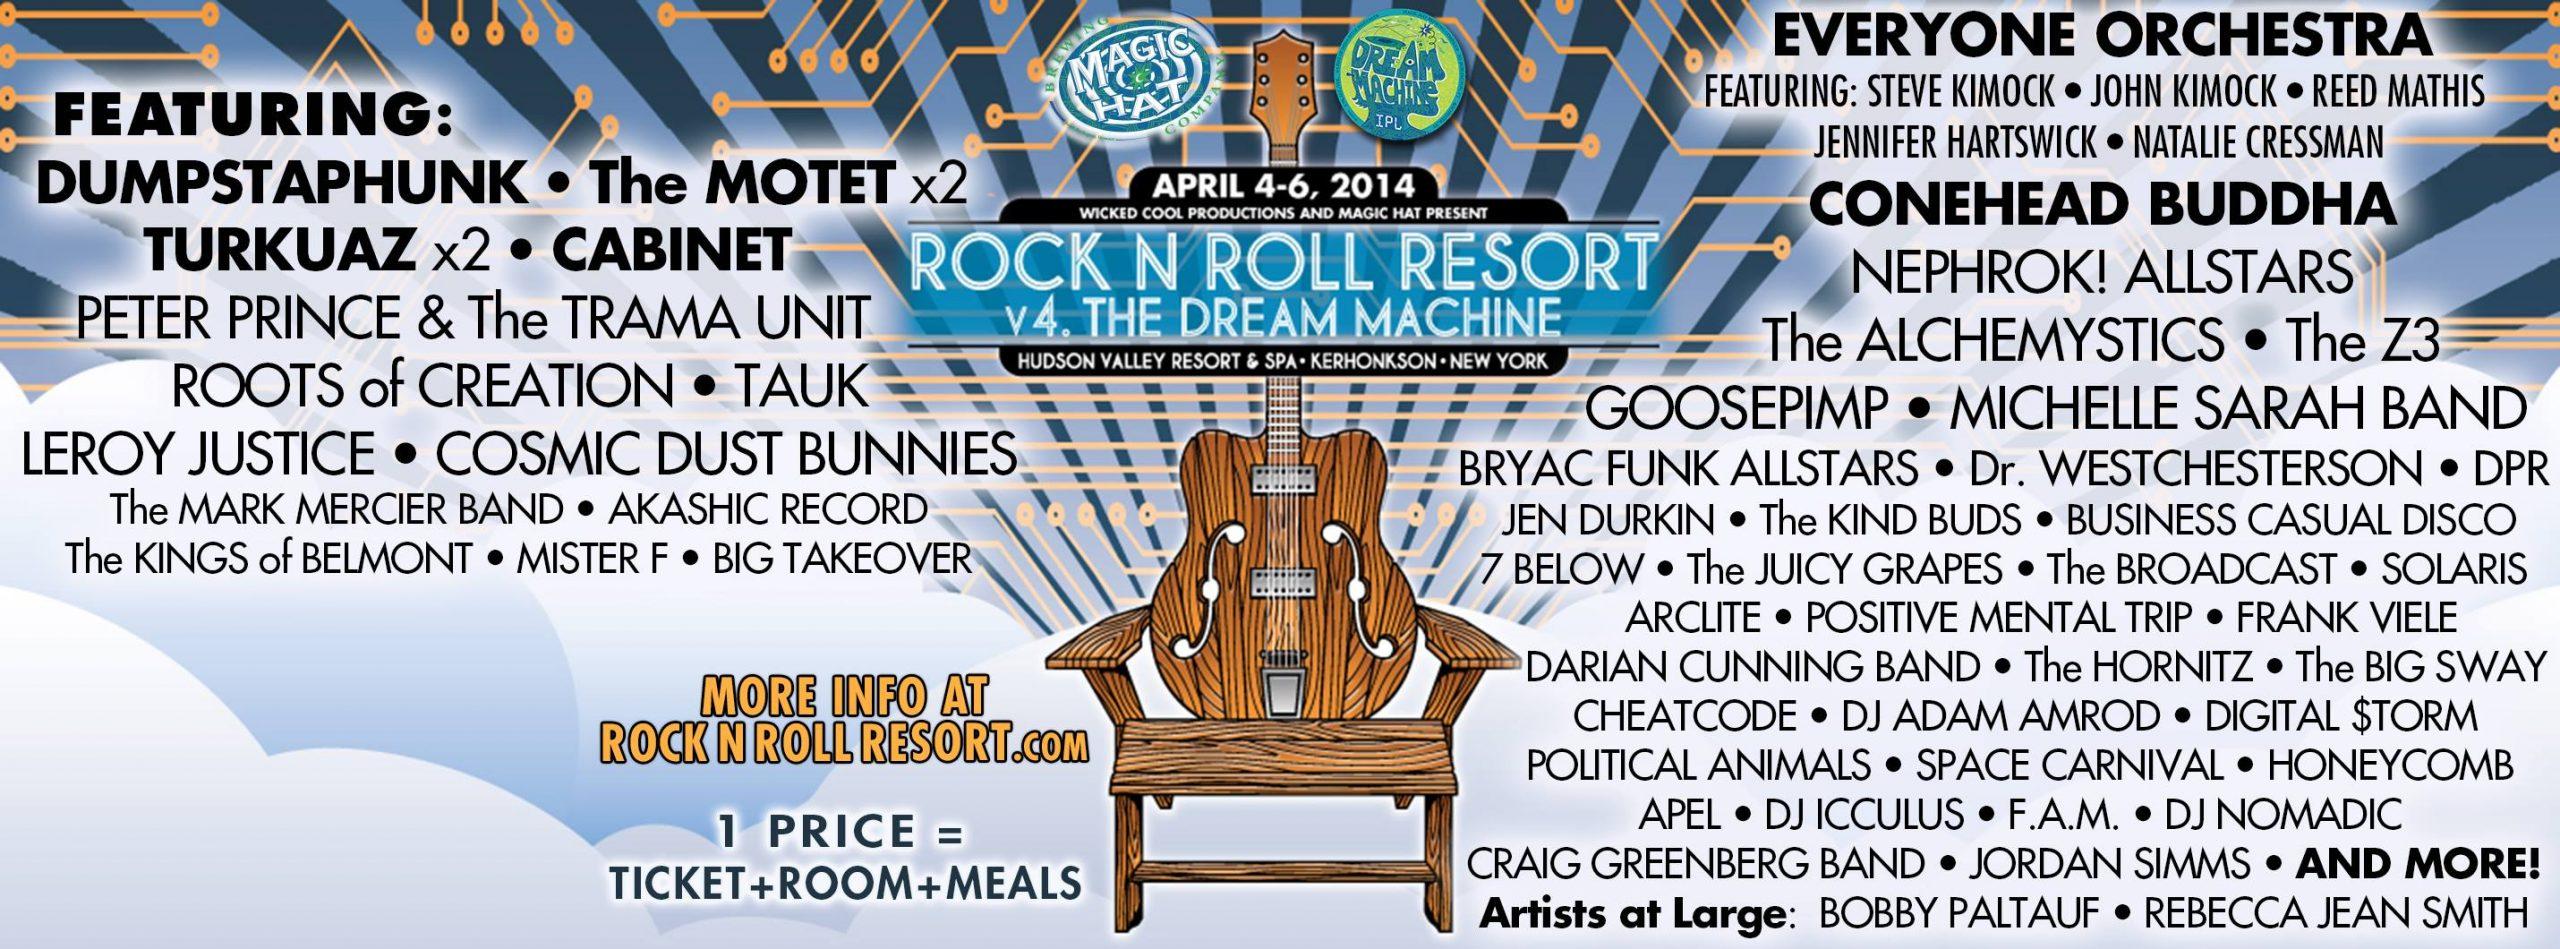 Rock n Roll Resort v4: The Dream Machine